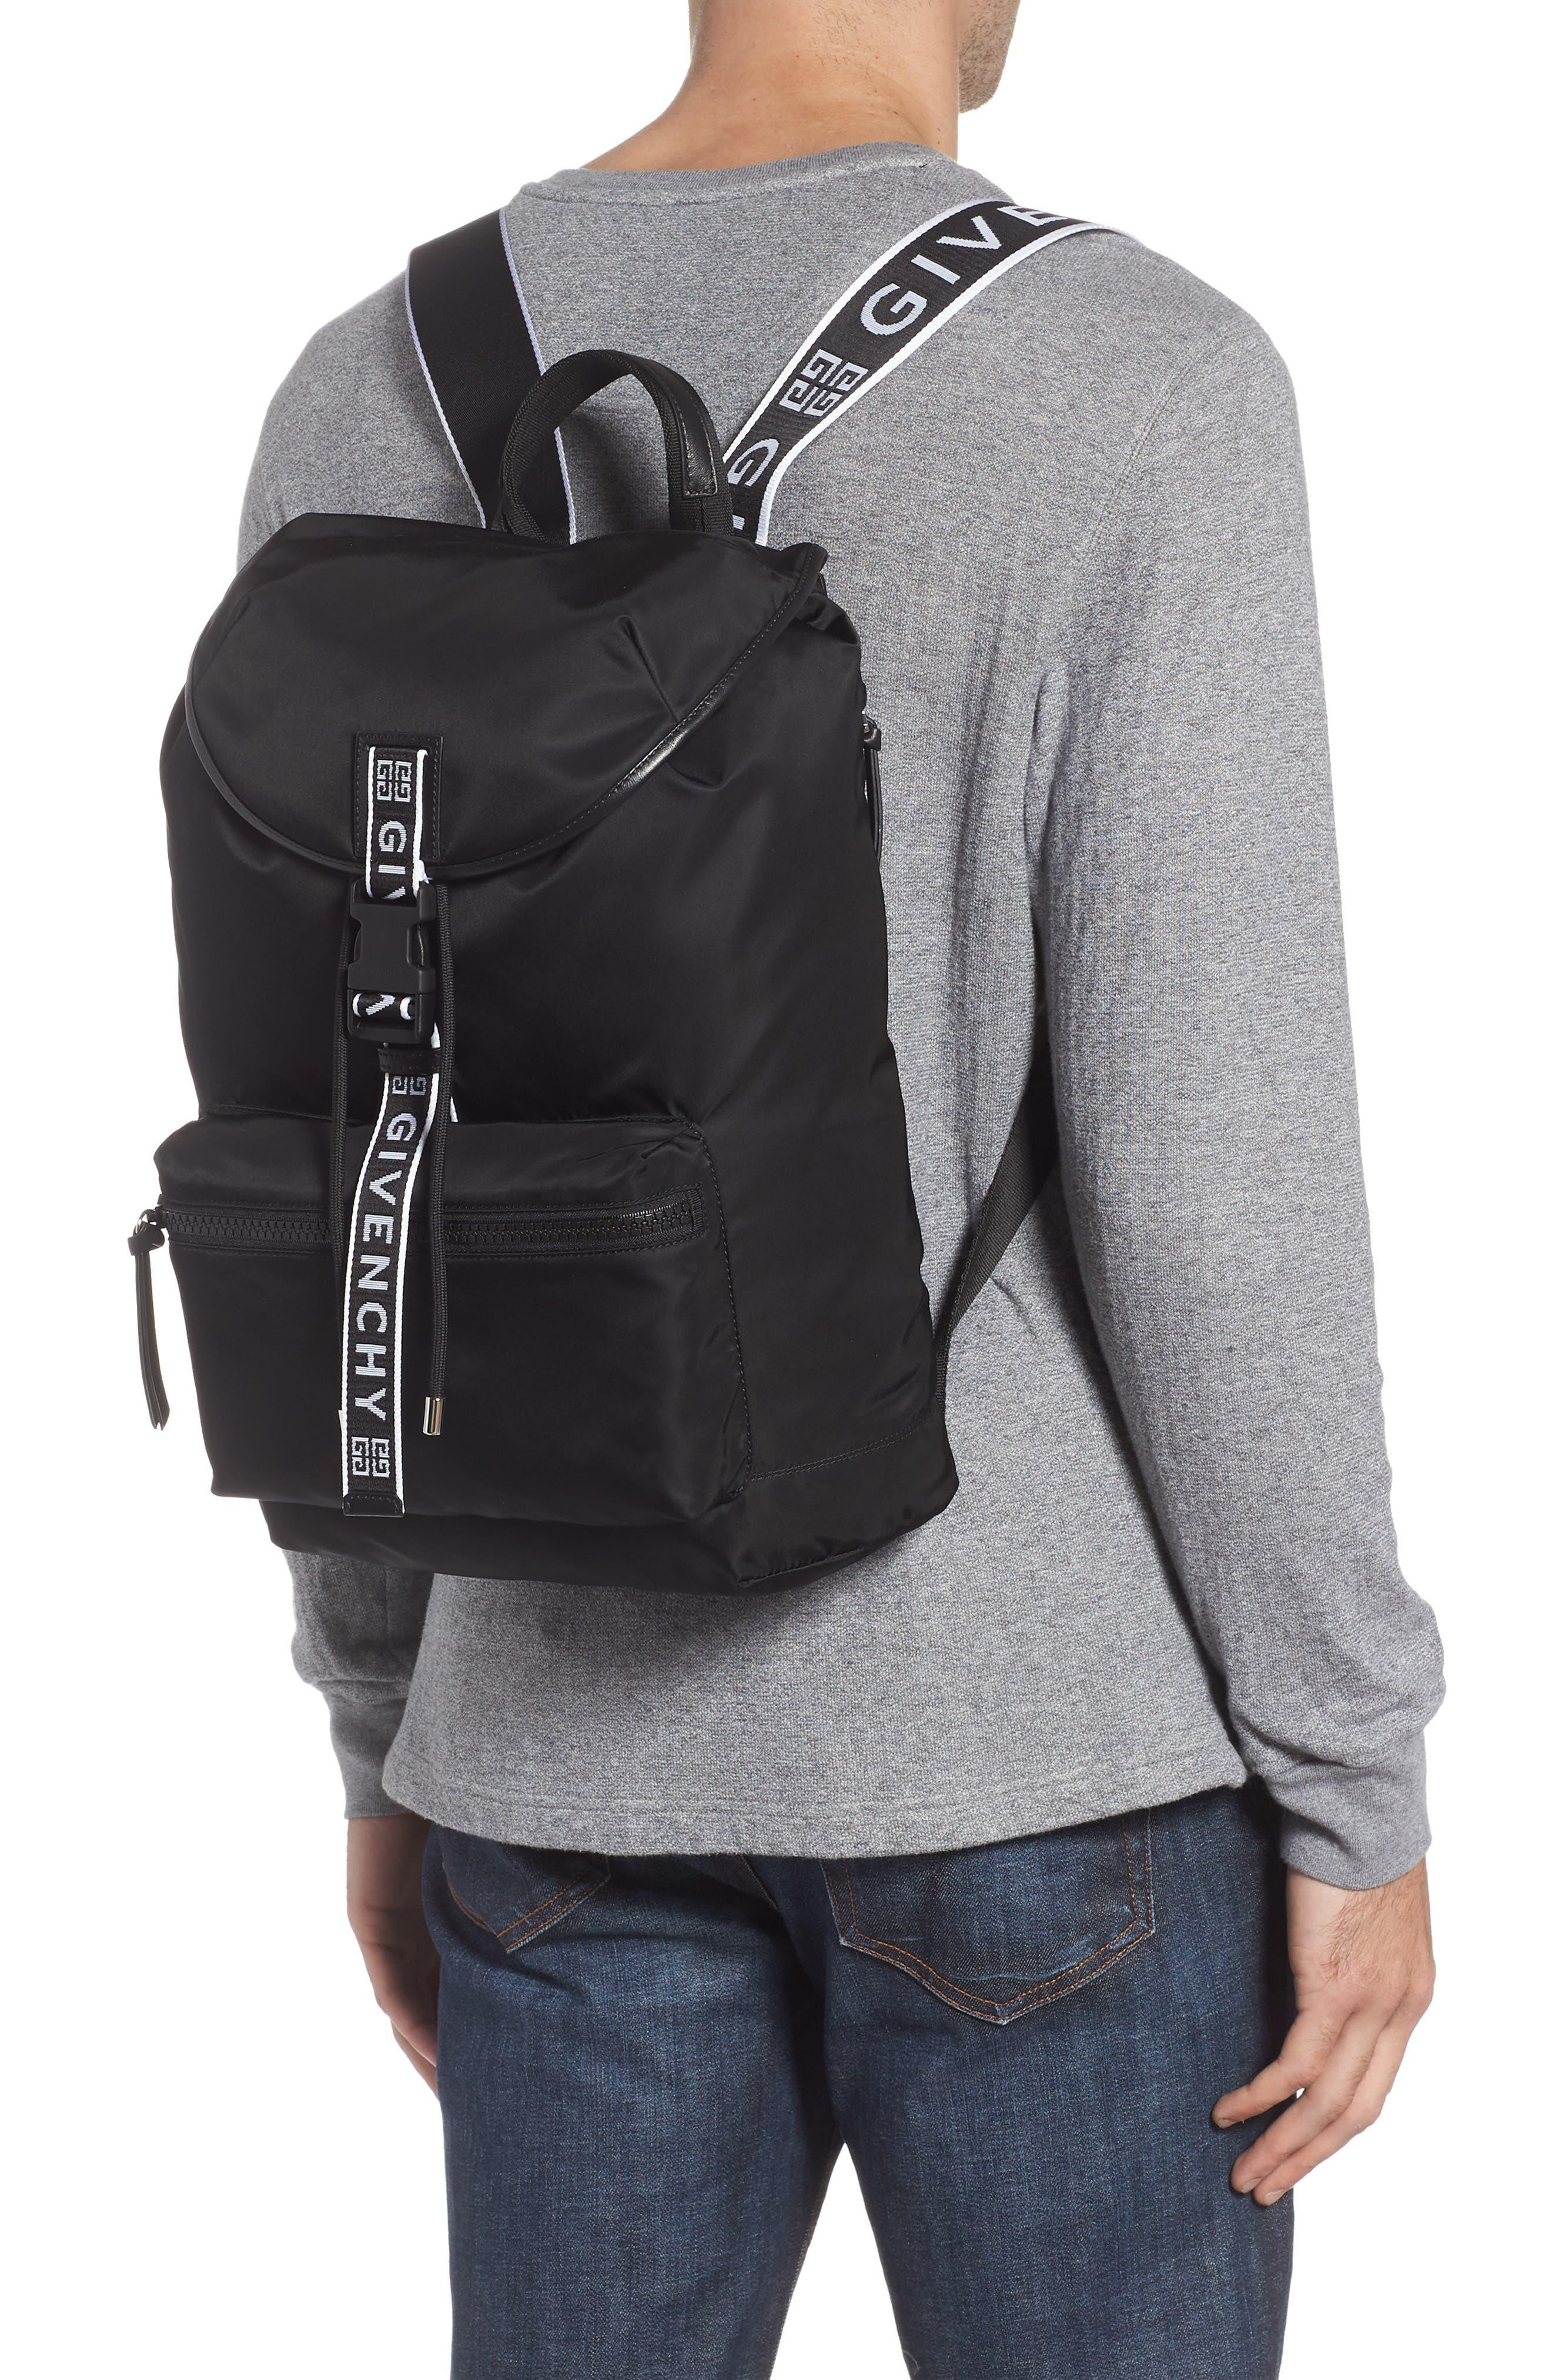 GIVENCHY, Light 3 Backpack, Alternate thumbnail 2, color, BLACK/ WHITE